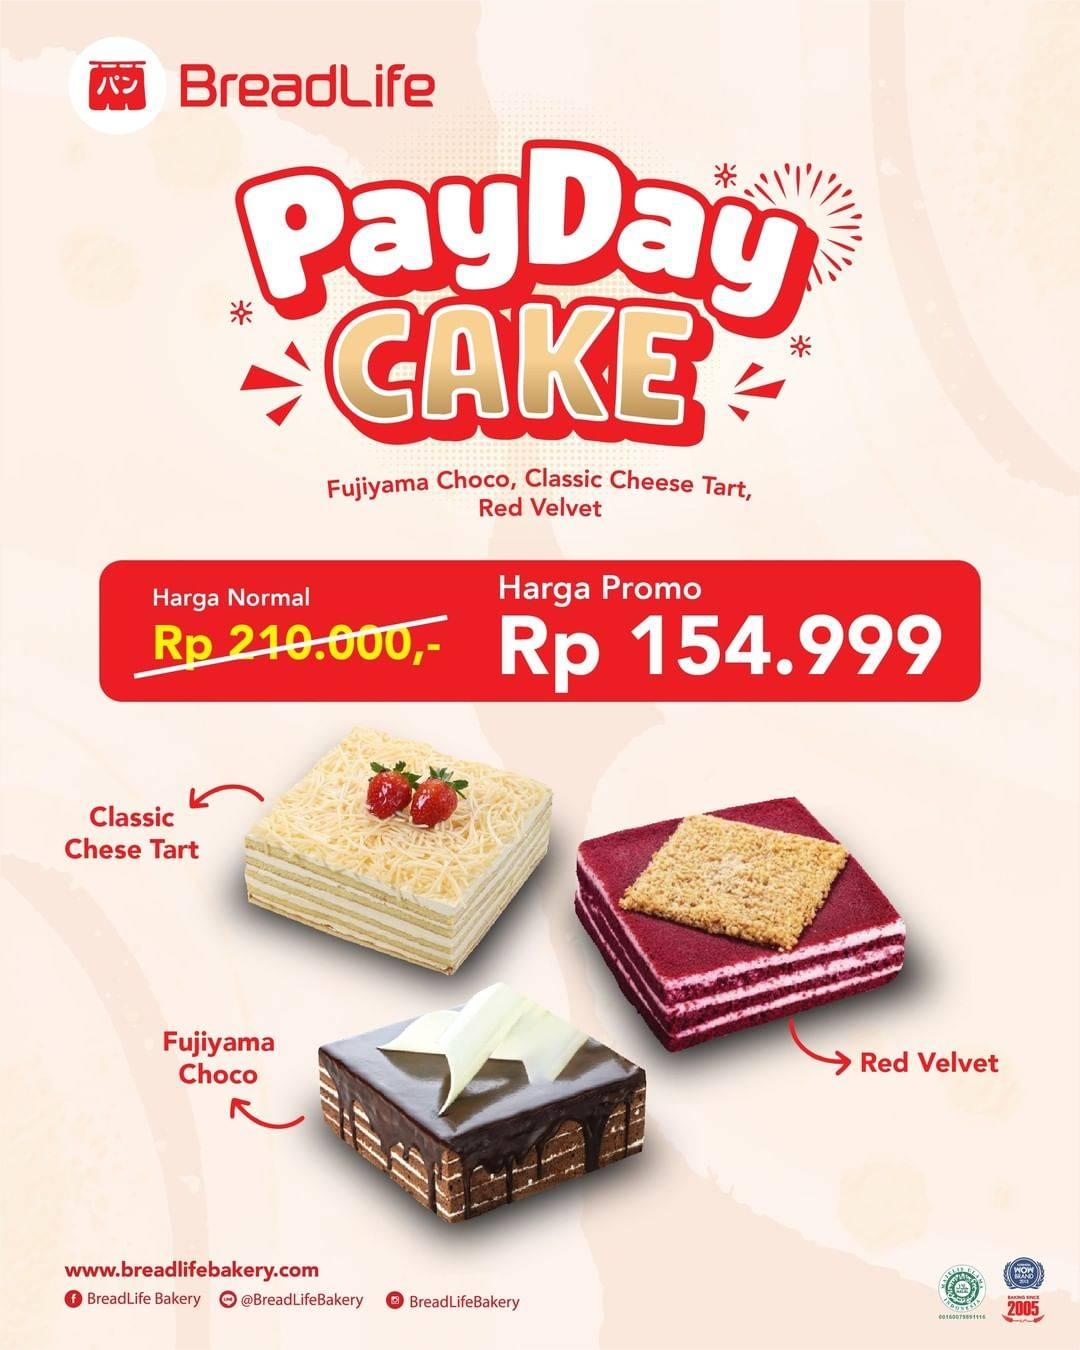 Diskon Breadlife Promo Payday Cake Hanya Rp. 154.999